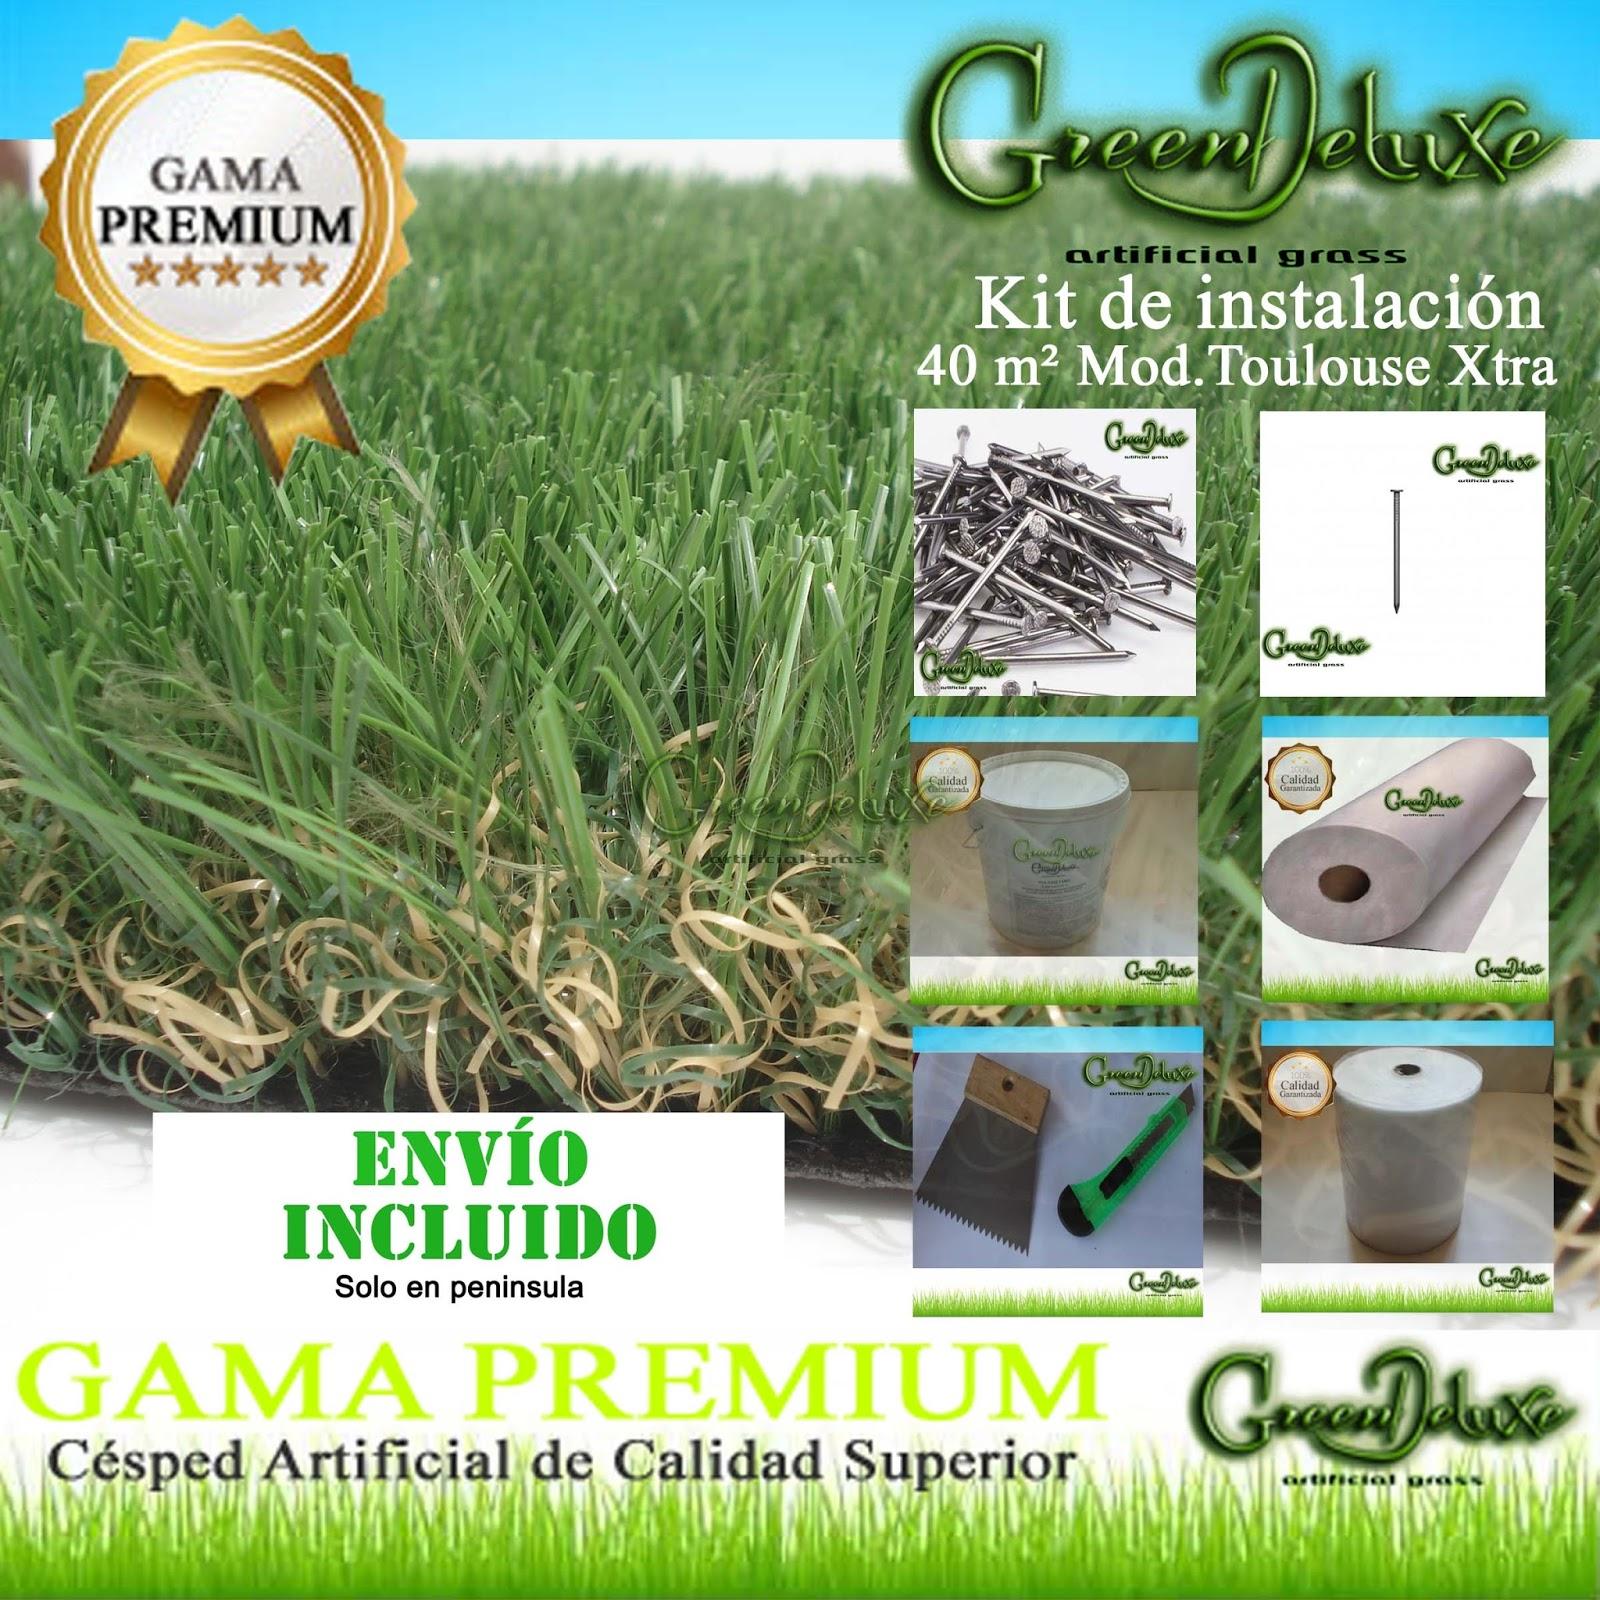 Ofertas c sped artificial barato c sped artificial barato - Cesped artificial oferta ...